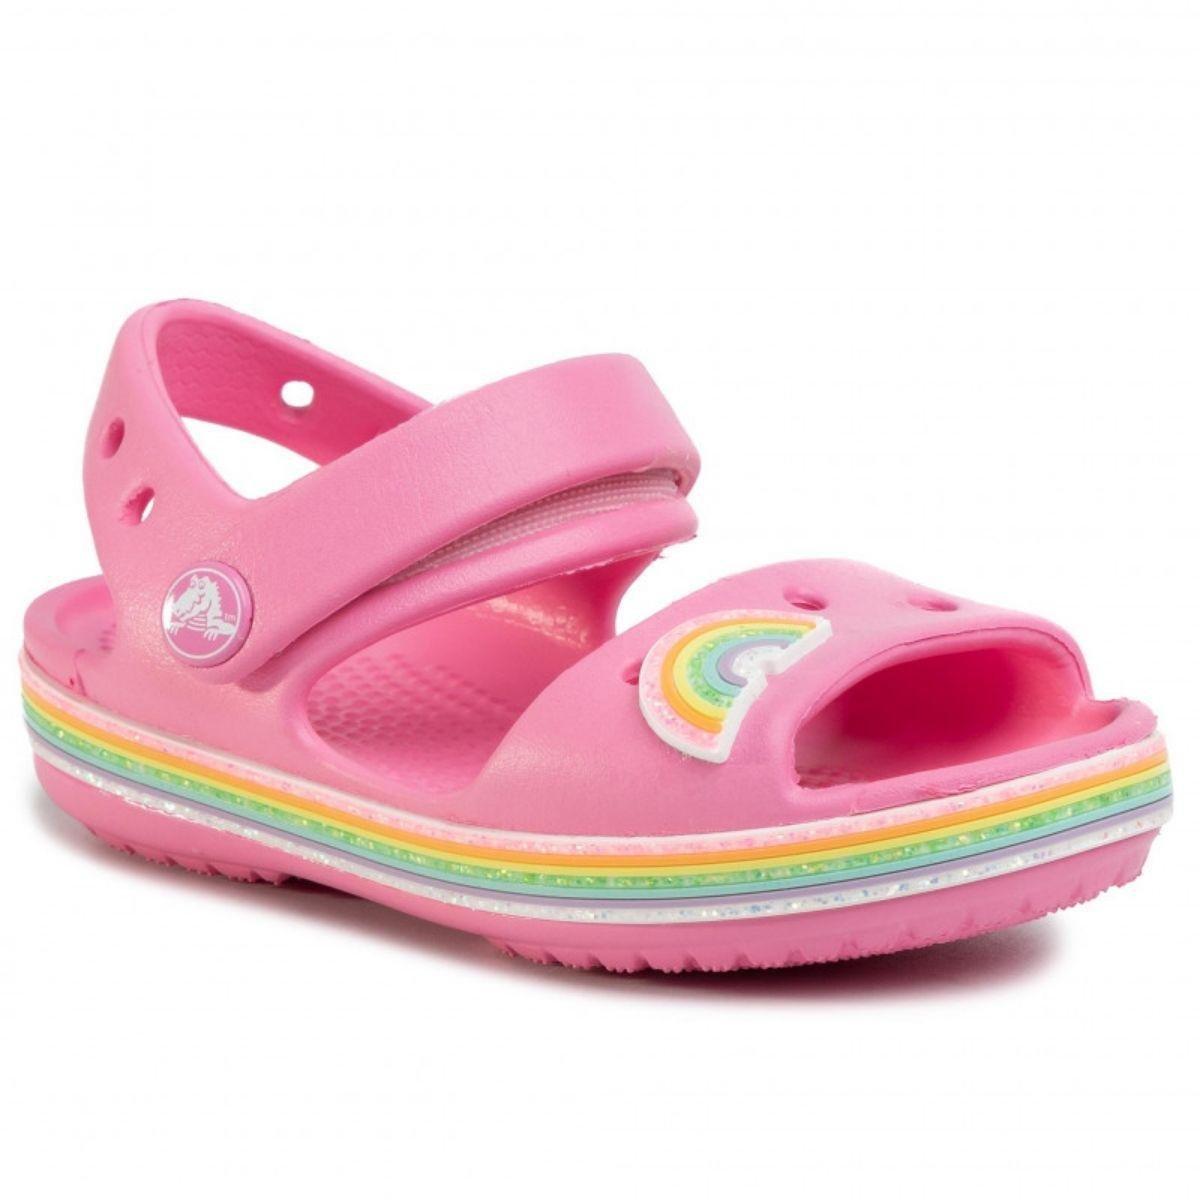 Sandalo Crocs Arcobaleno...